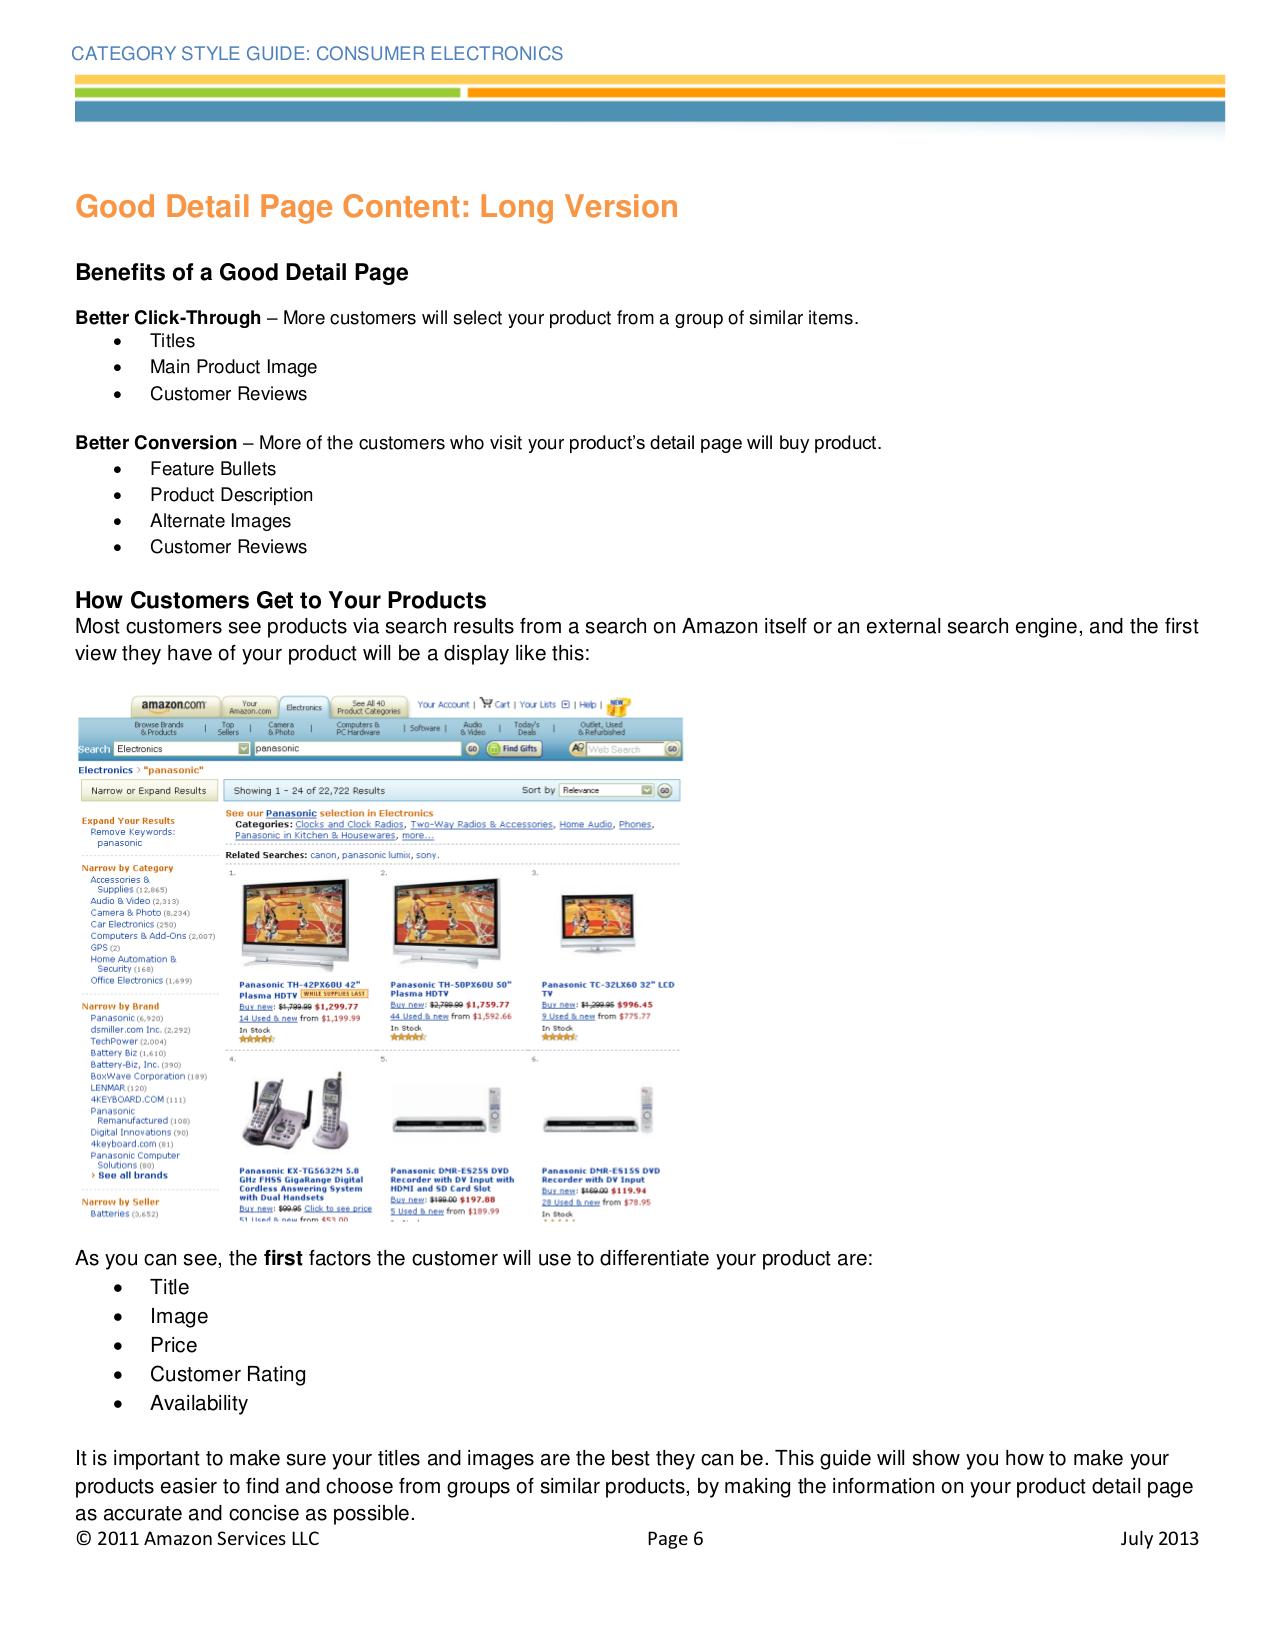 Kodak Digital Photo Frame EasyShare S510 pdf page preview